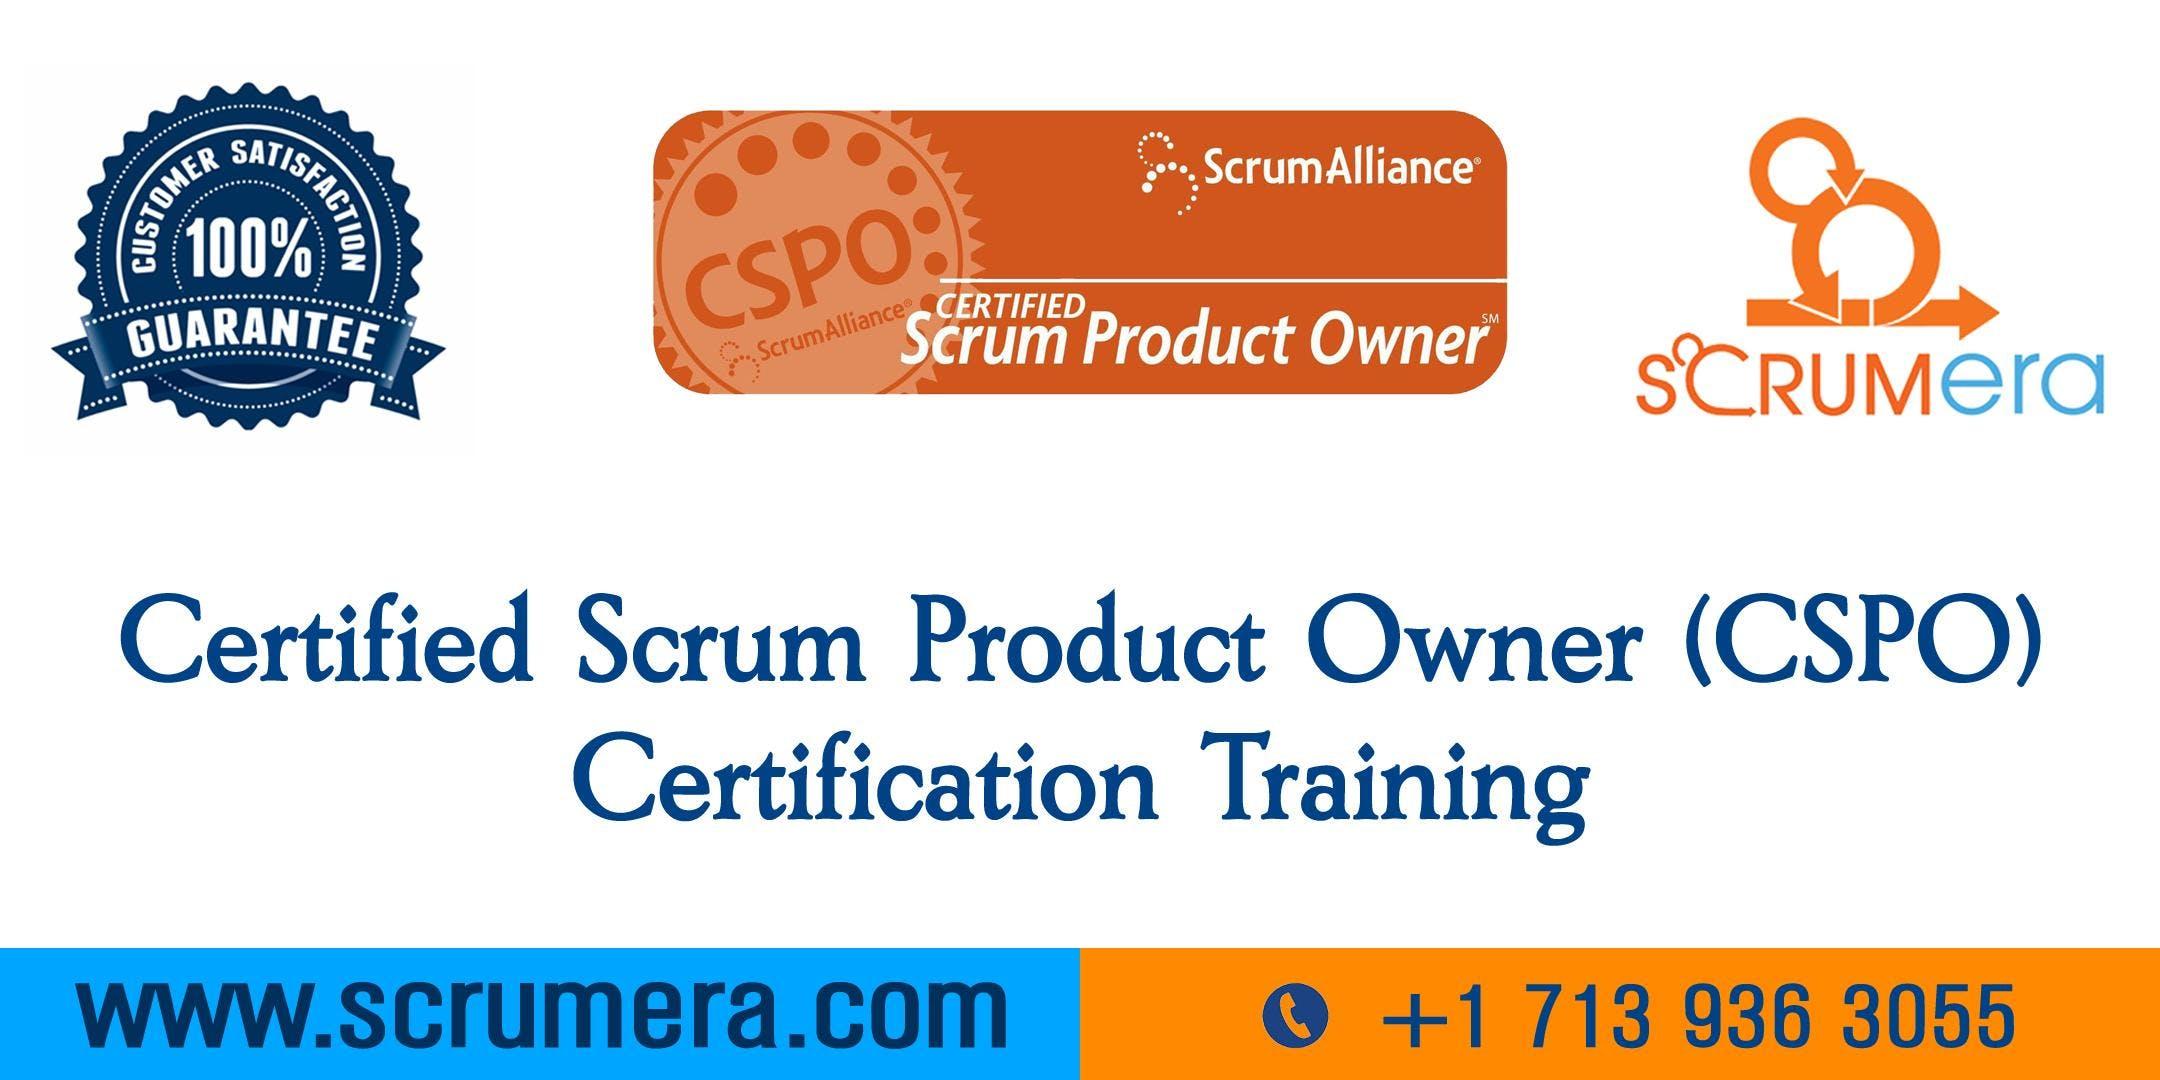 Certified Scrum Product Owner (CSPO) Certification | CSPO Training | CSPO Certification Workshop | Certified Scrum Product Owner (CSPO) Training in Tempe, AZ | ScrumERA